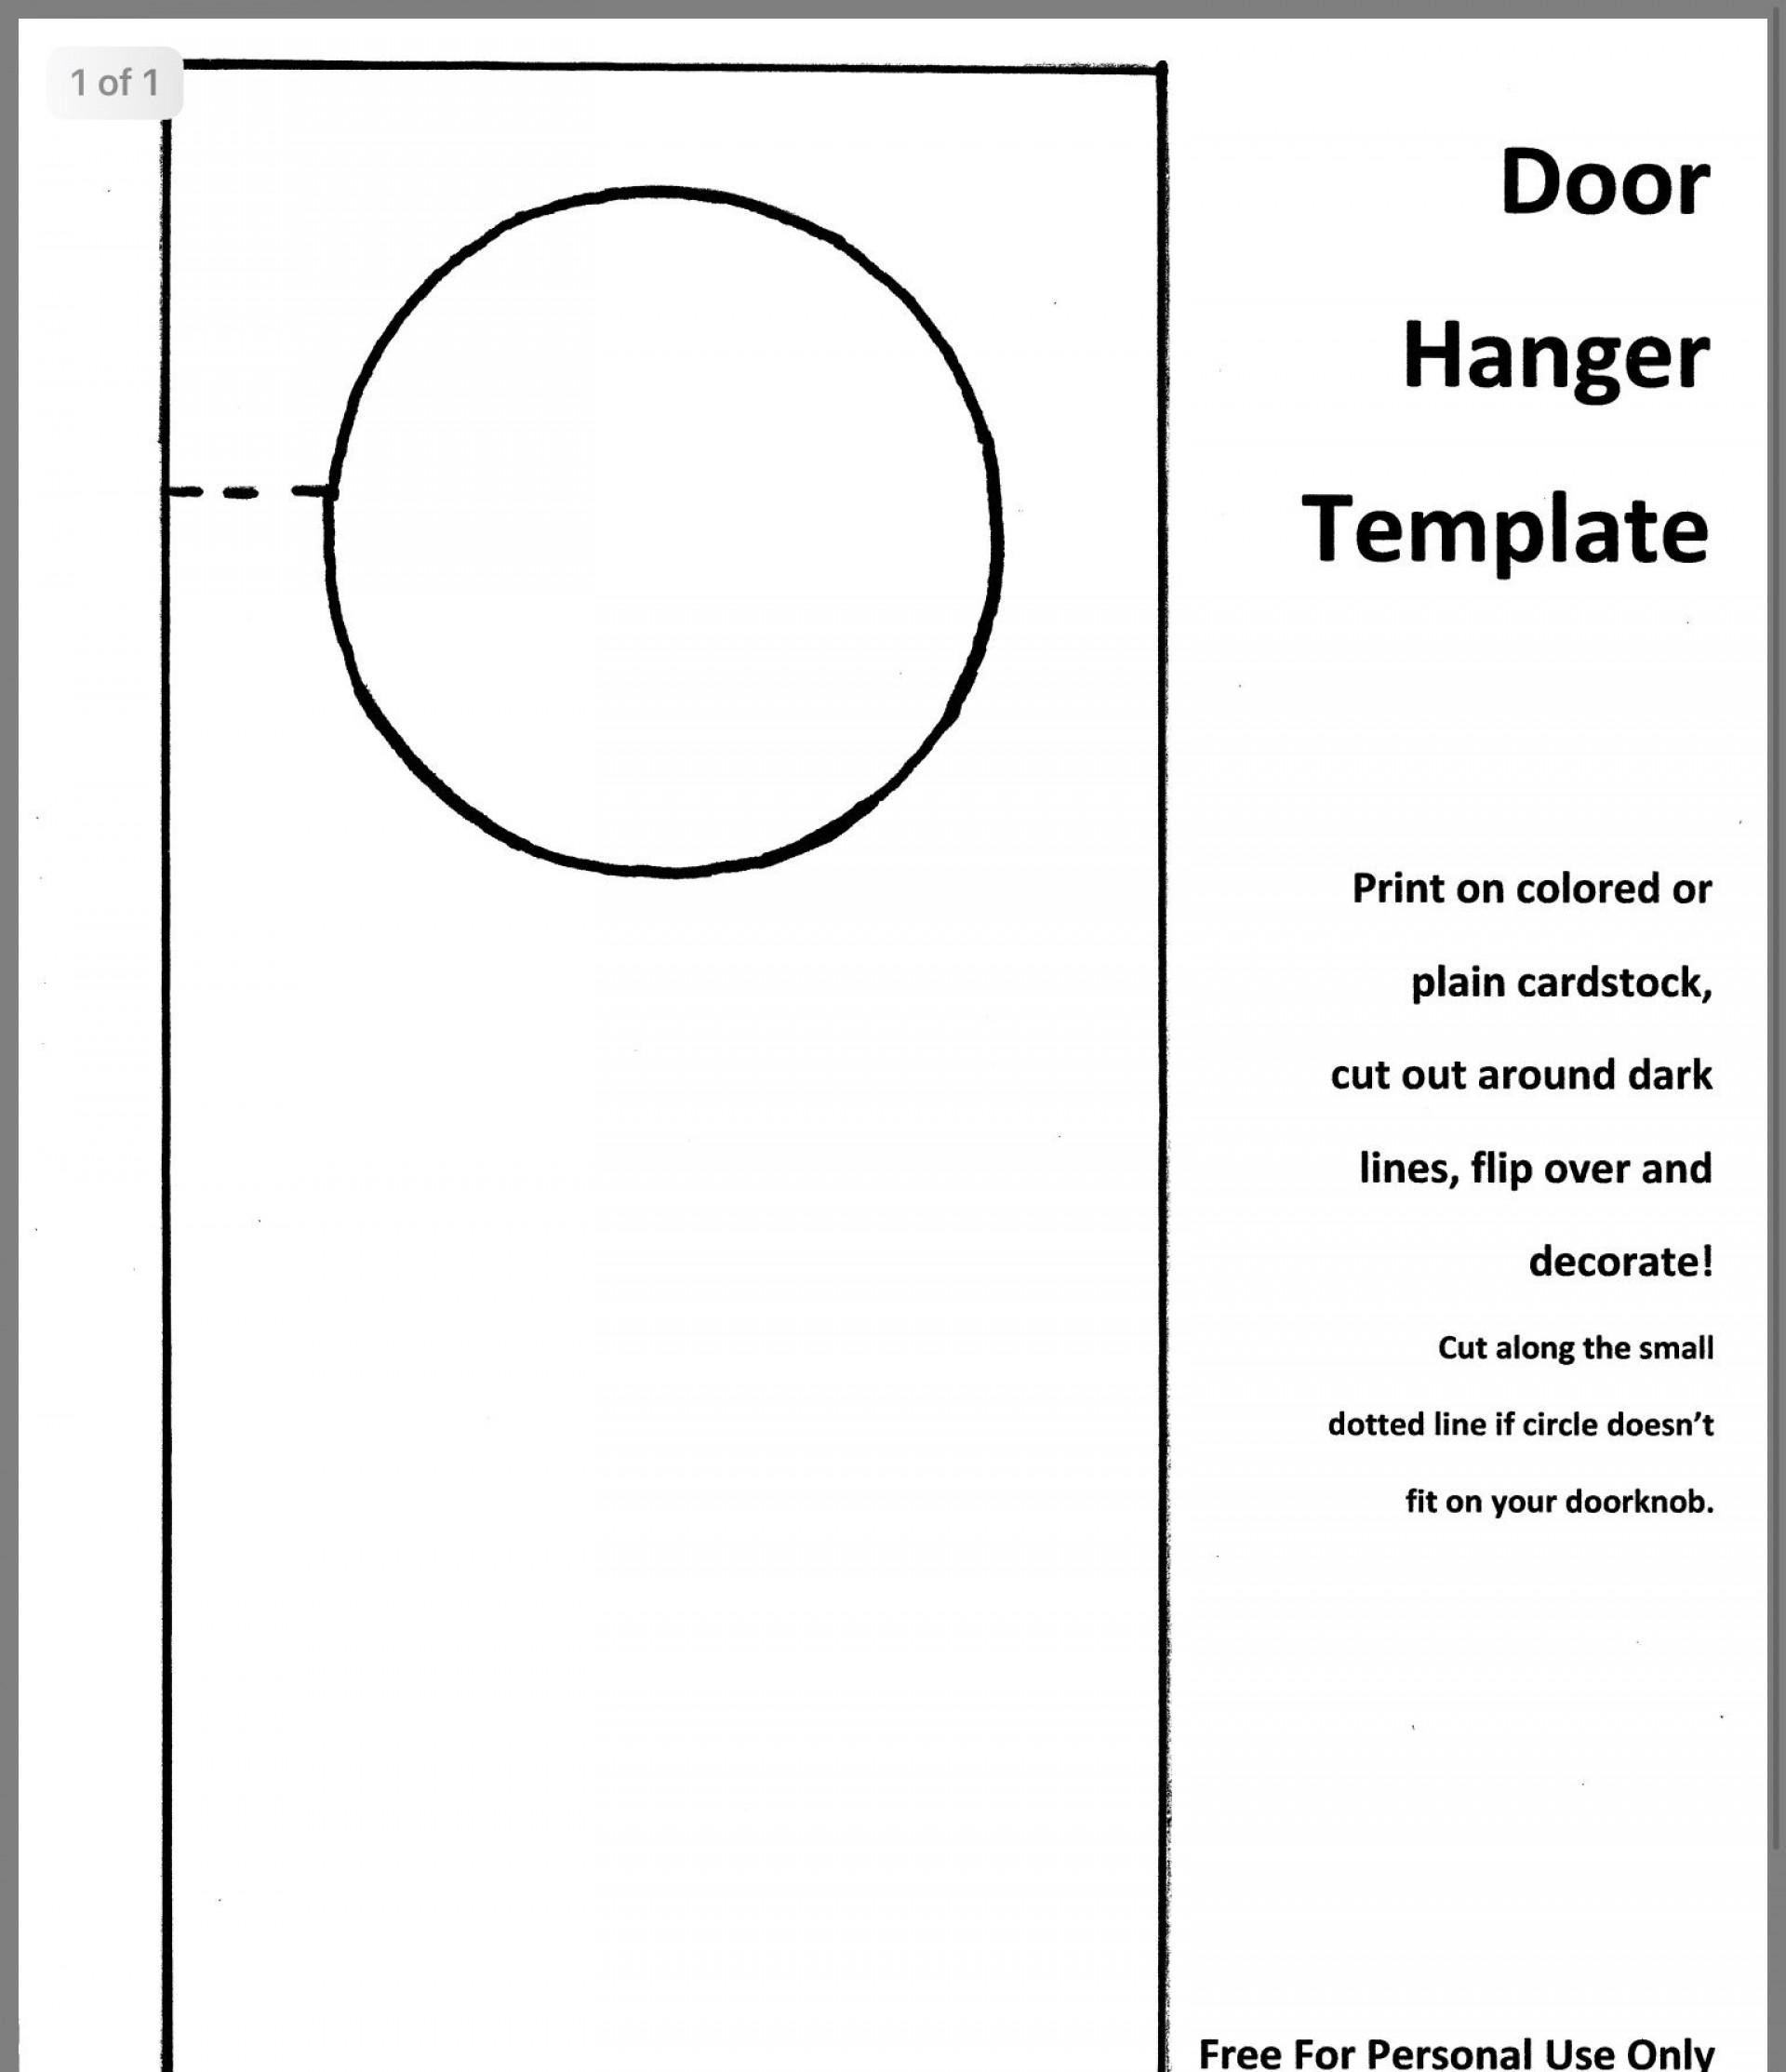 000 Wonderful Door Hanger Template For Word Photo  Free Microsoft1920